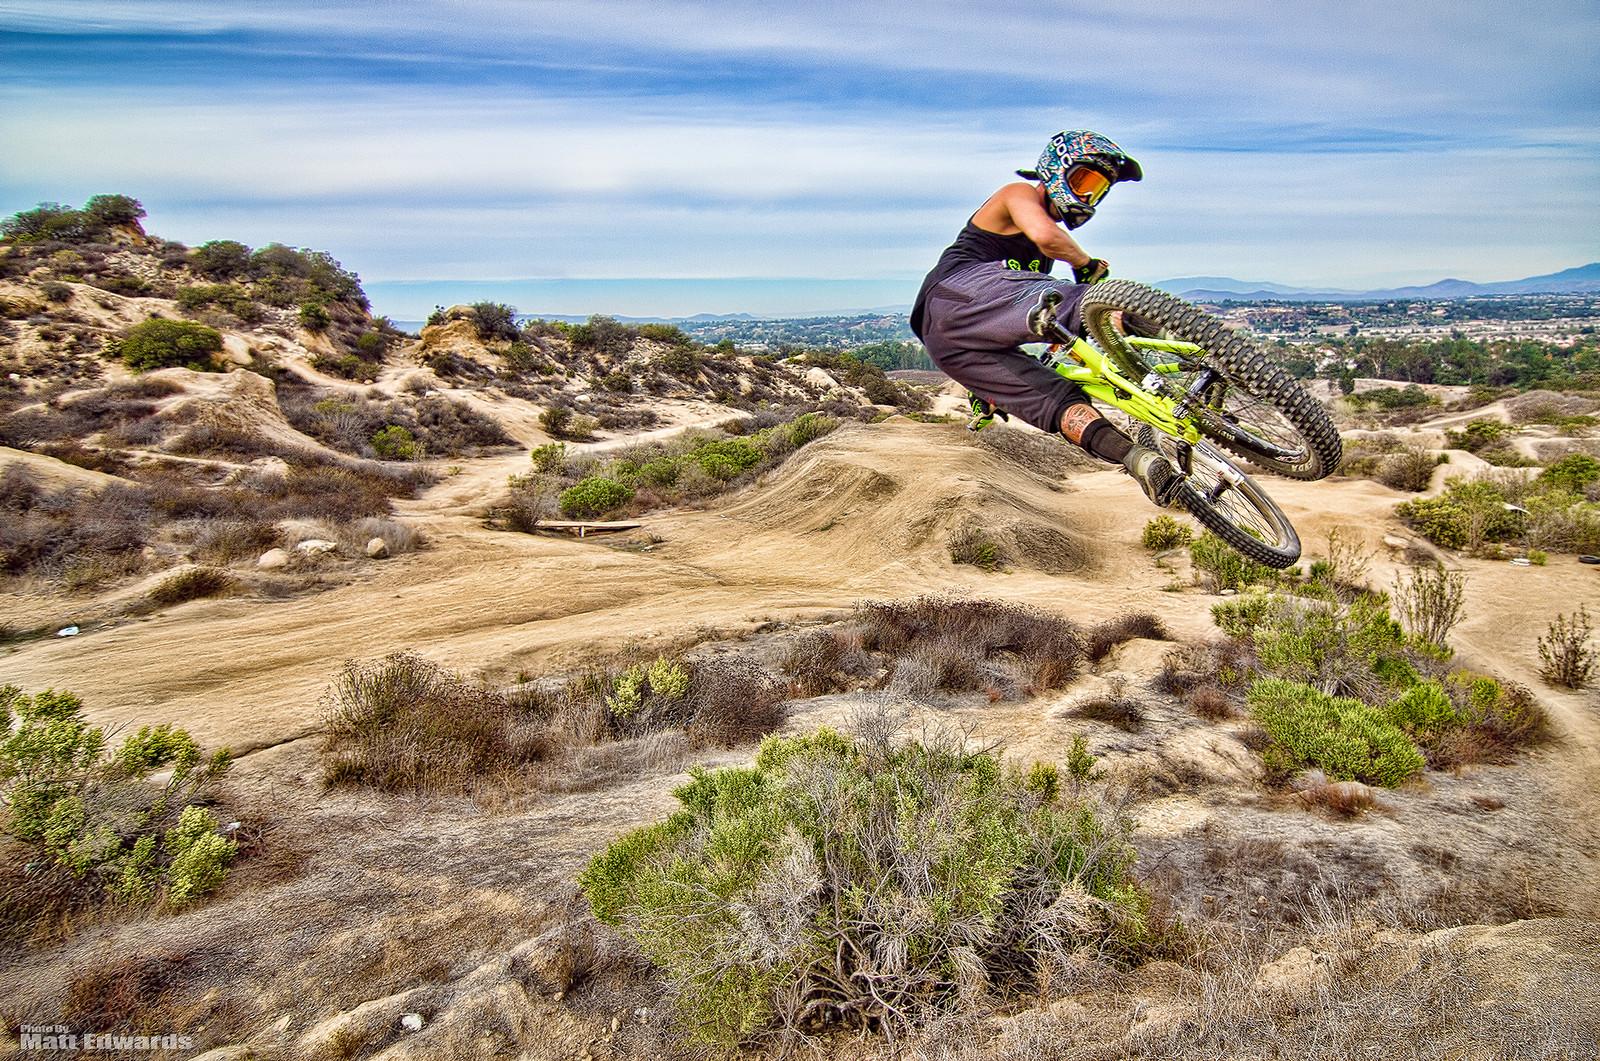 Whip on the hip! - EdwardsEntertainment - Mountain Biking Pictures - Vital MTB